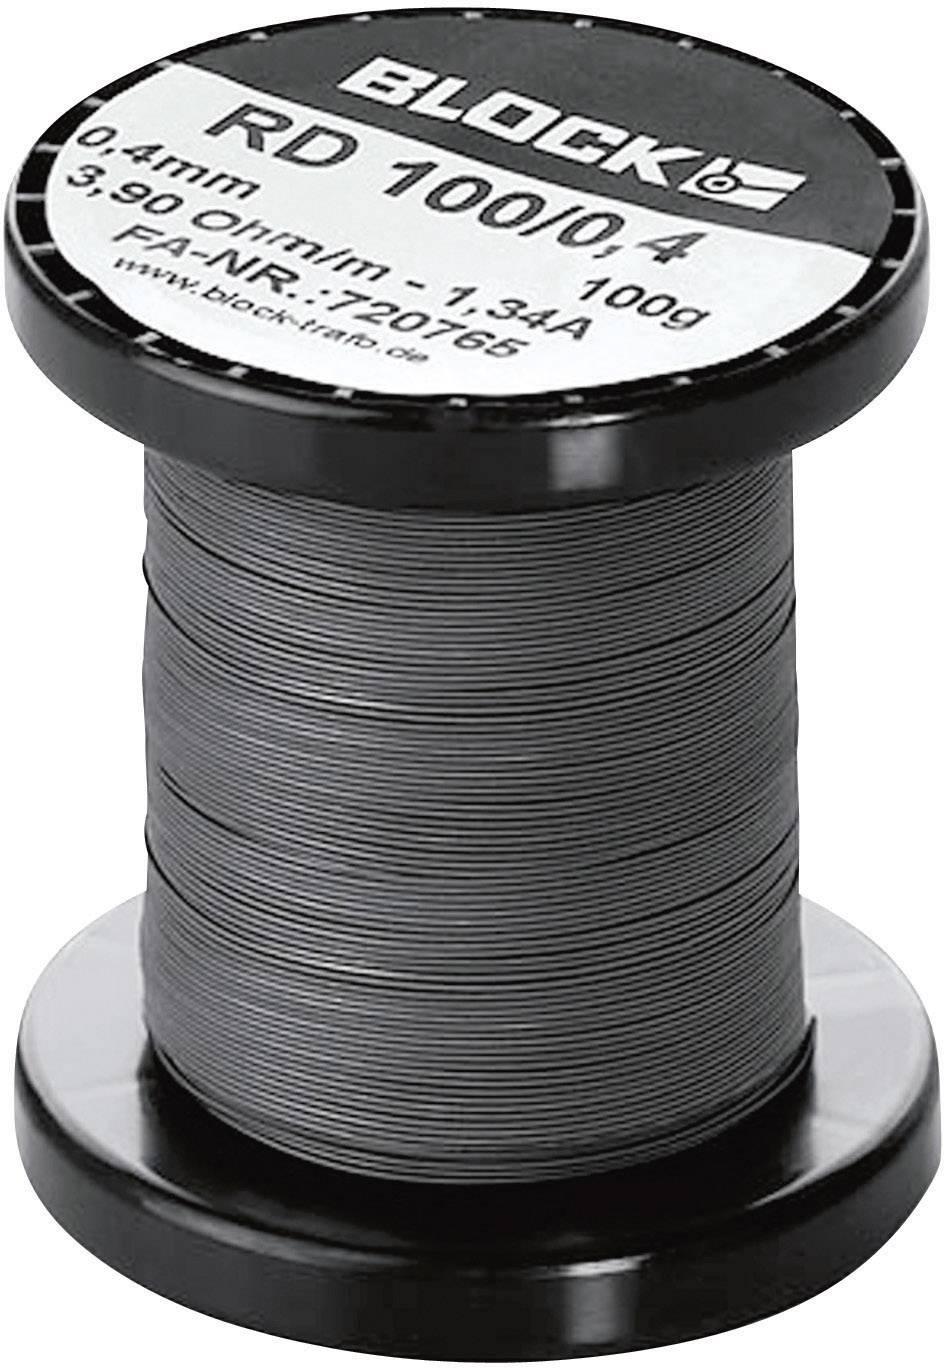 Odporový drát (konstantan) Block RD 100/0,6, 1.73 Ω/m, 39 m